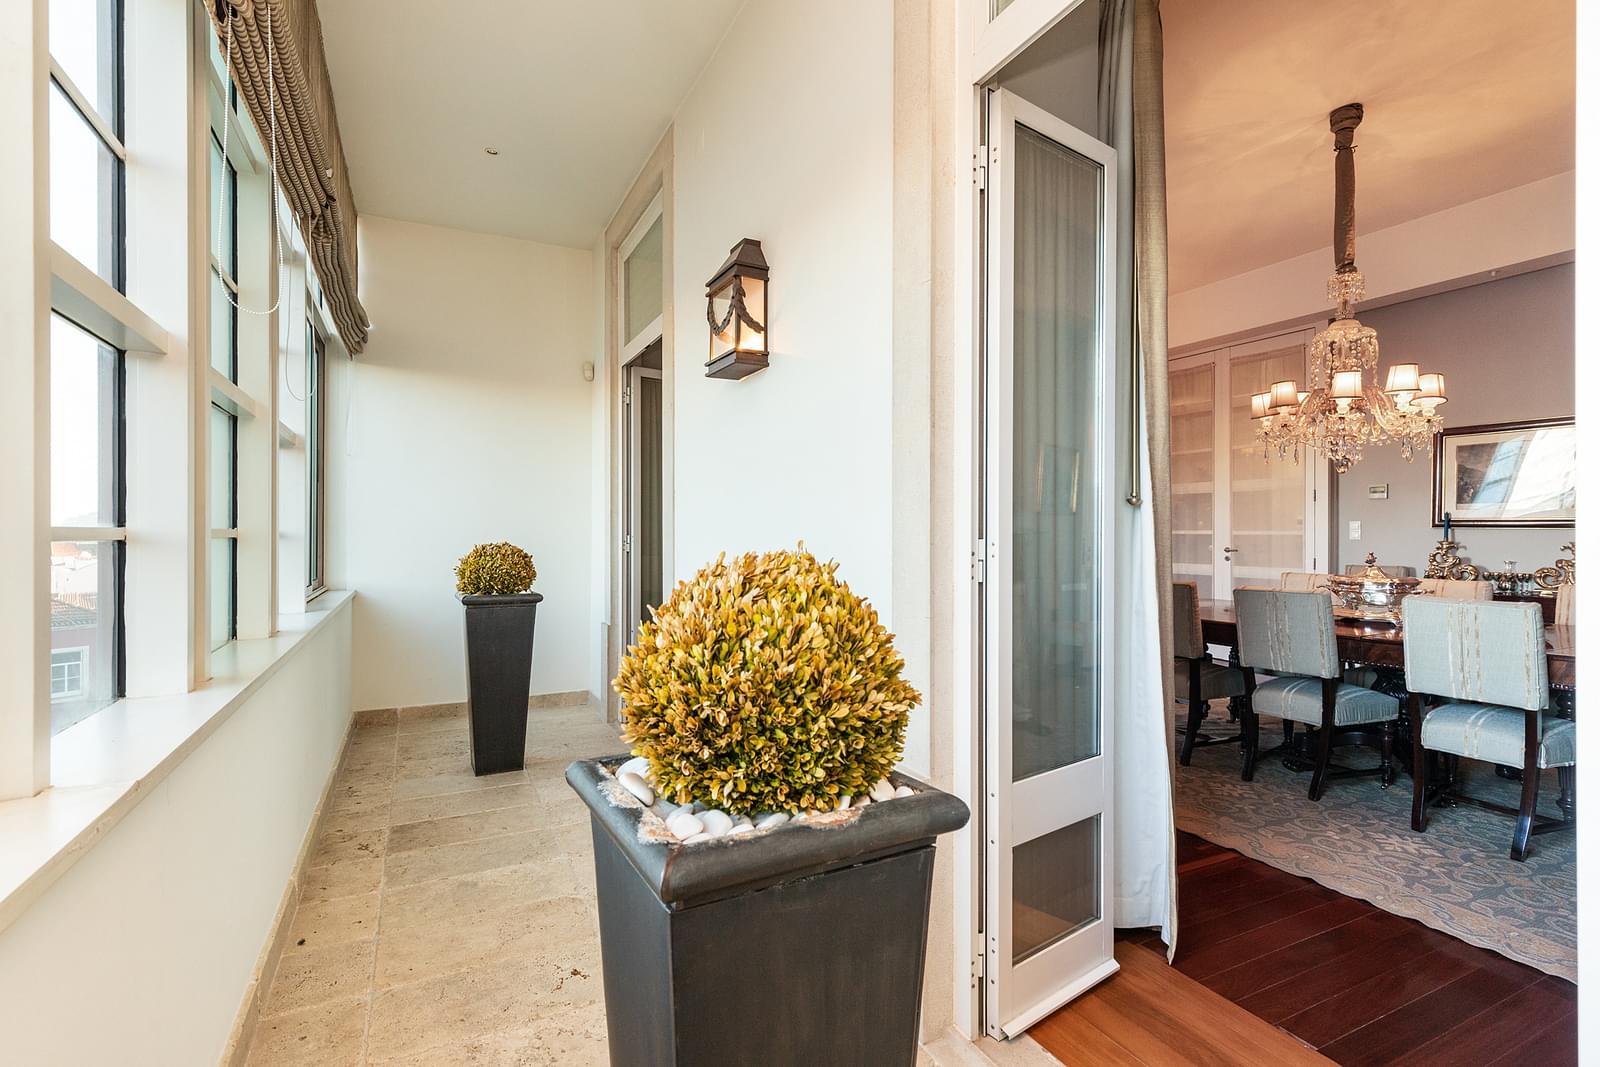 pf18843-apartamento-t3-2-lisboa-1111996e-9ca1-4065-b5f4-b70abb9171f0